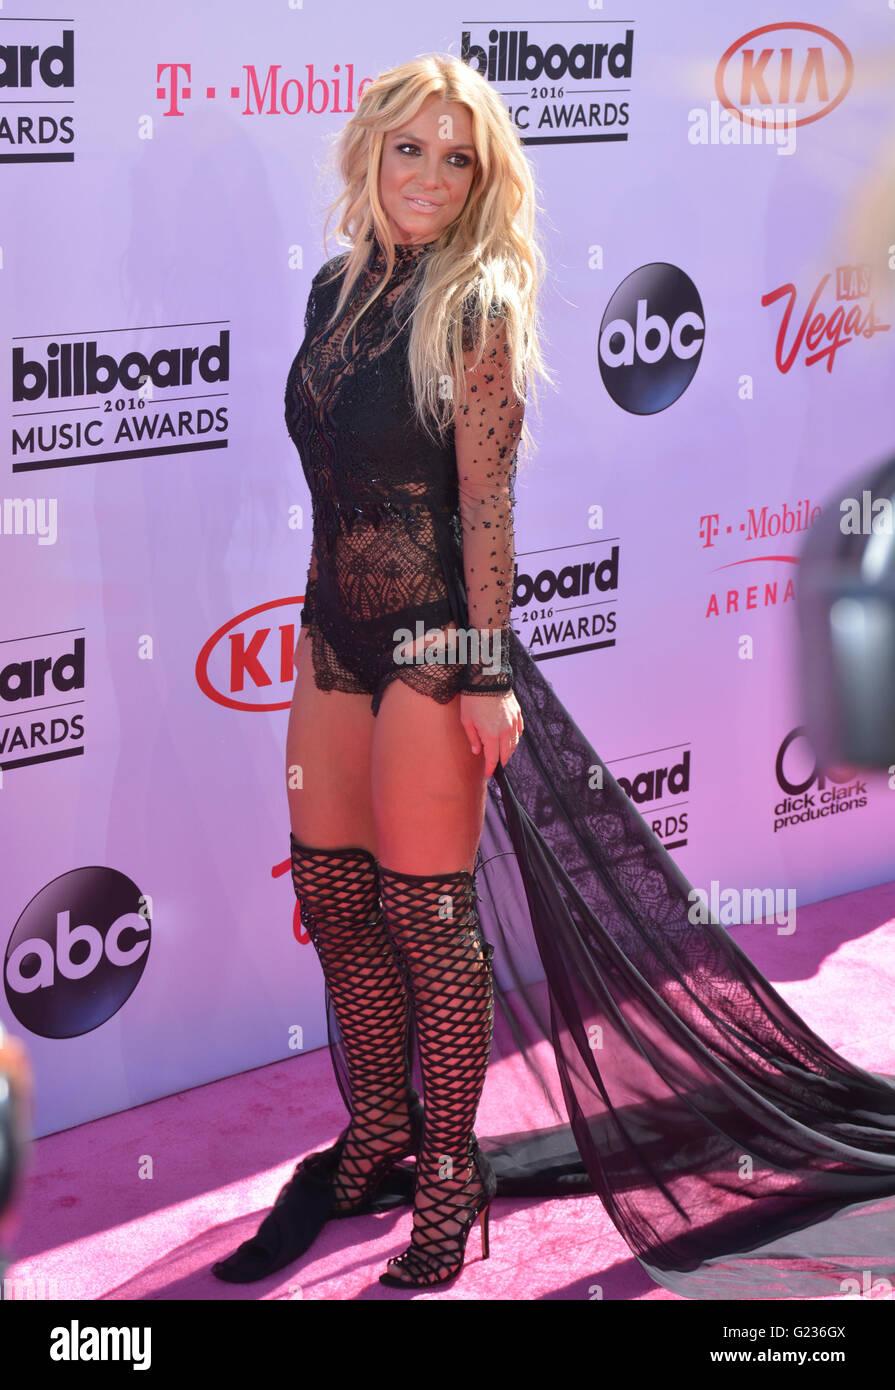 Britney spears vegas dates in Sydney